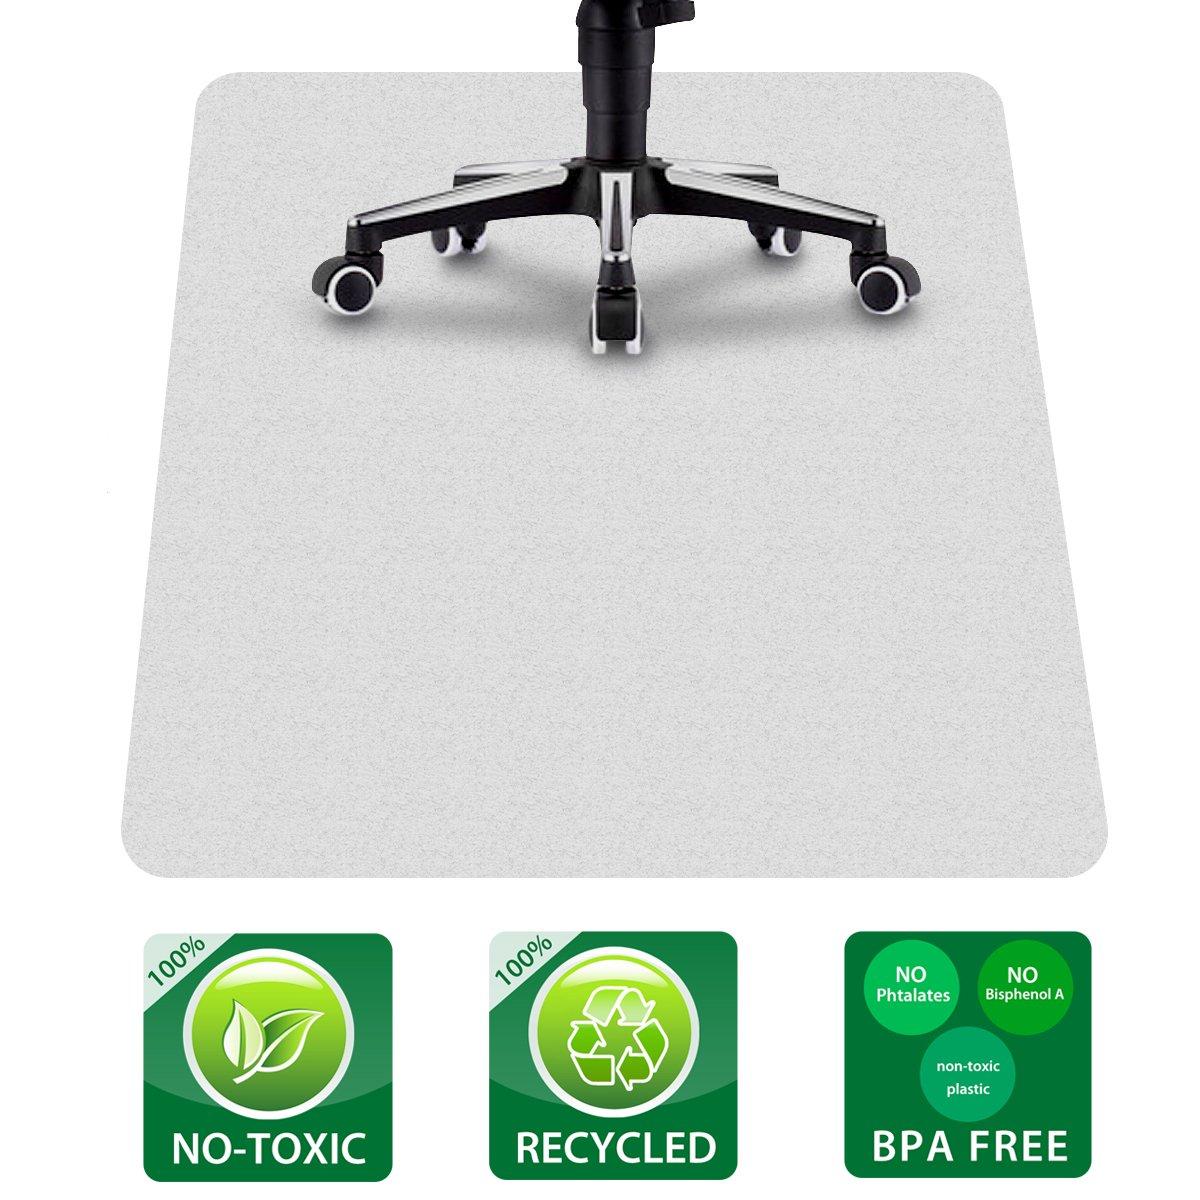 JCHL Office Chair Mat for Hardwood Floors 35.4''x47.2'' PE Chair Desk Mat Non-Toxic, BPA Free, Phthalate Free Hard Floor Desk Mat White